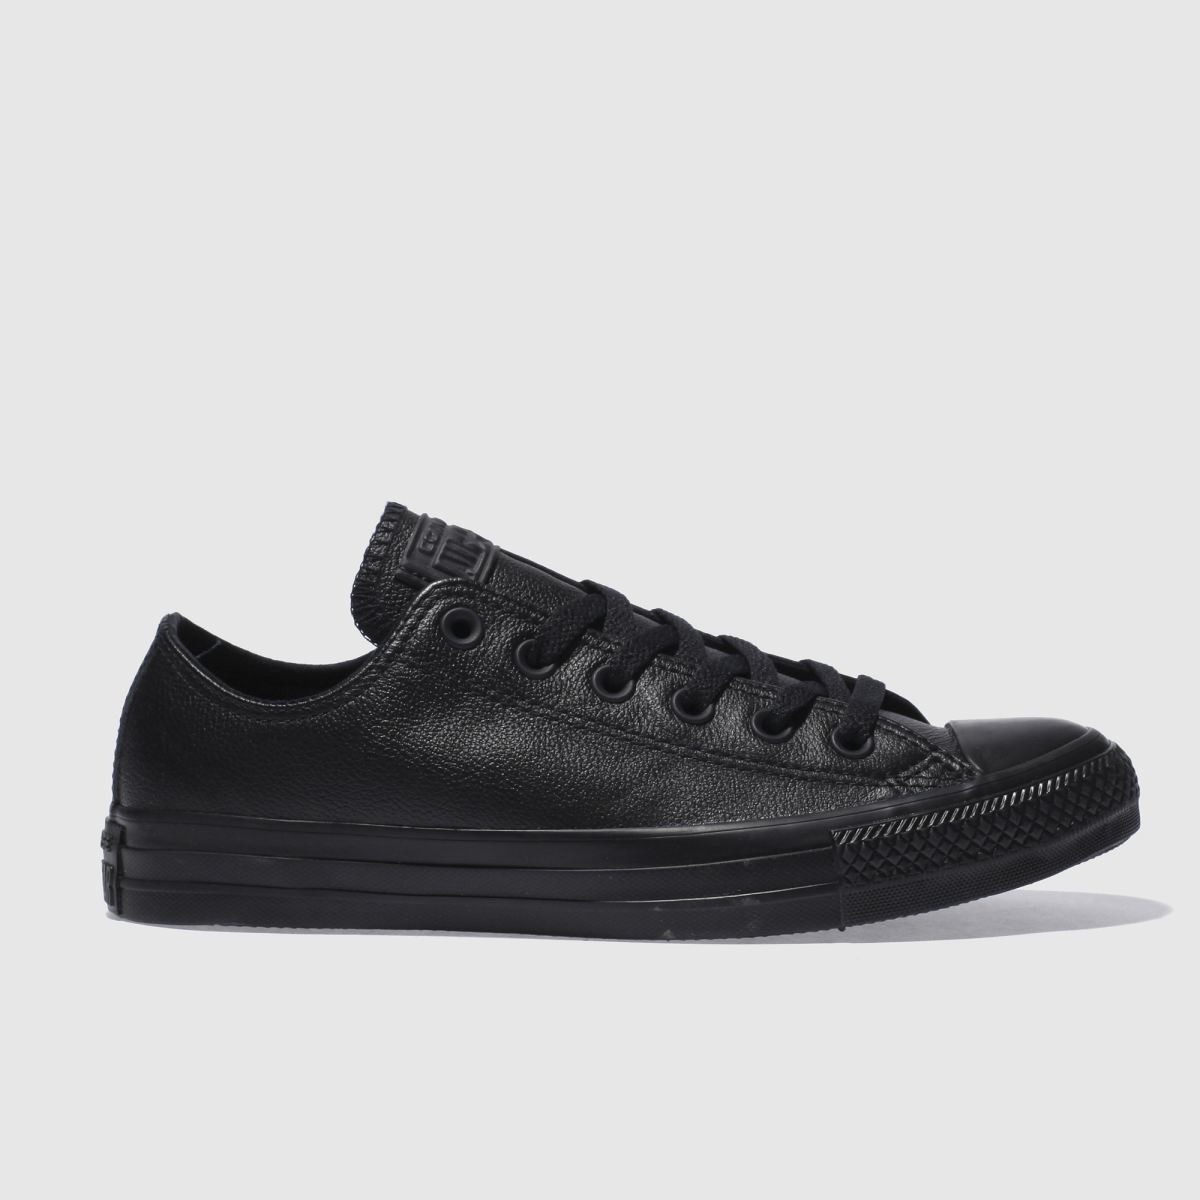 Black Converse School Shoes